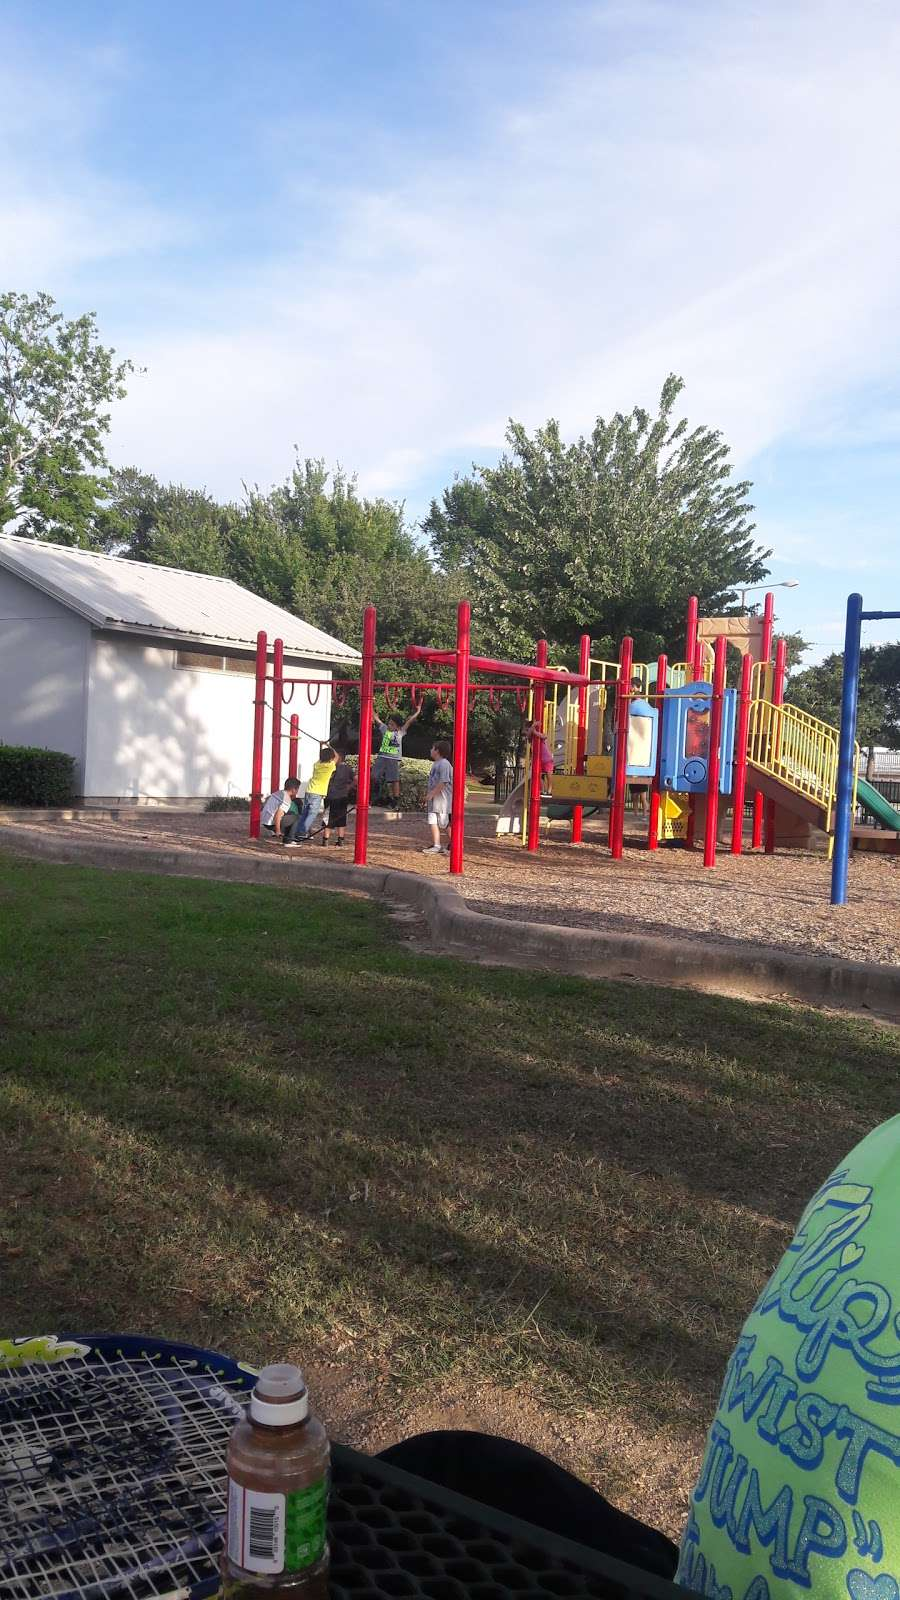 Fry Road Park - park  | Photo 6 of 10 | Address: 19818 Franz Rd, Katy, TX 77449, USA | Phone: (281) 496-2177